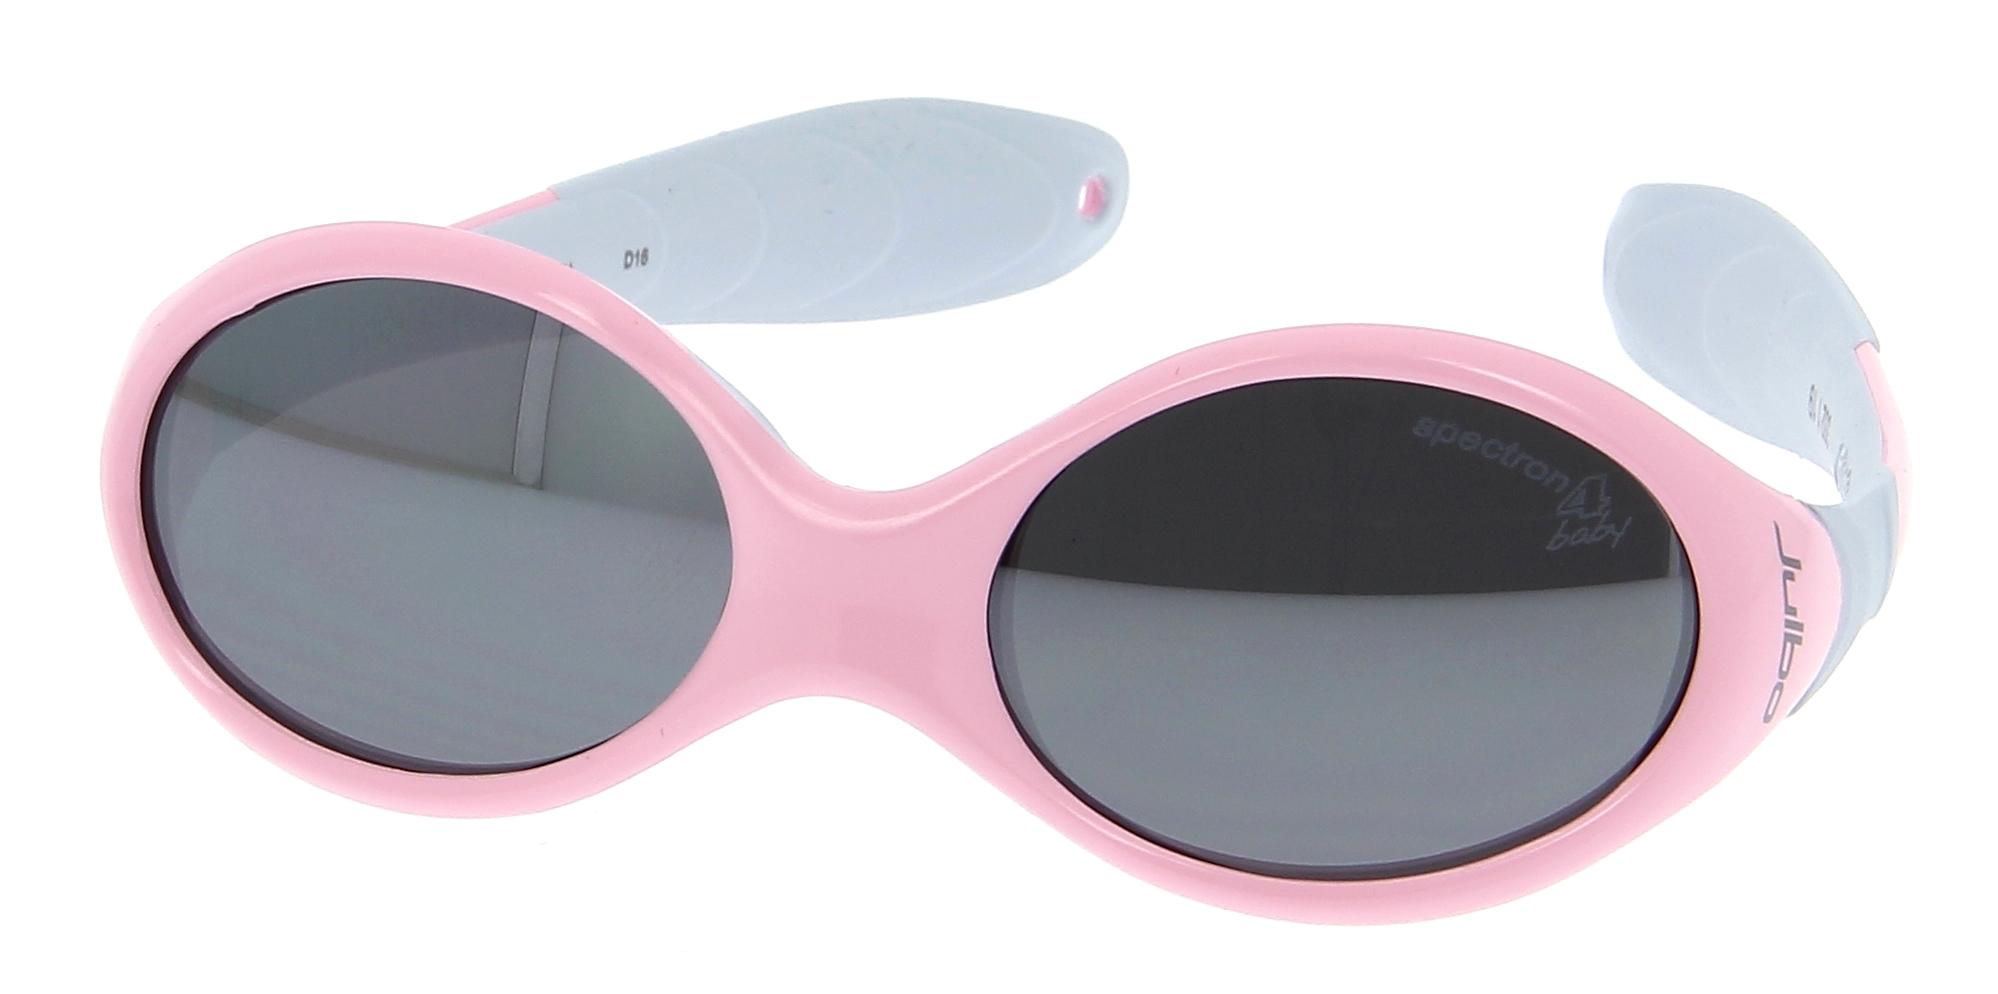 lunettes de soleil julbo j332 119c looping 2 42 14 b b rose bleu ovale cercl e tendance. Black Bedroom Furniture Sets. Home Design Ideas